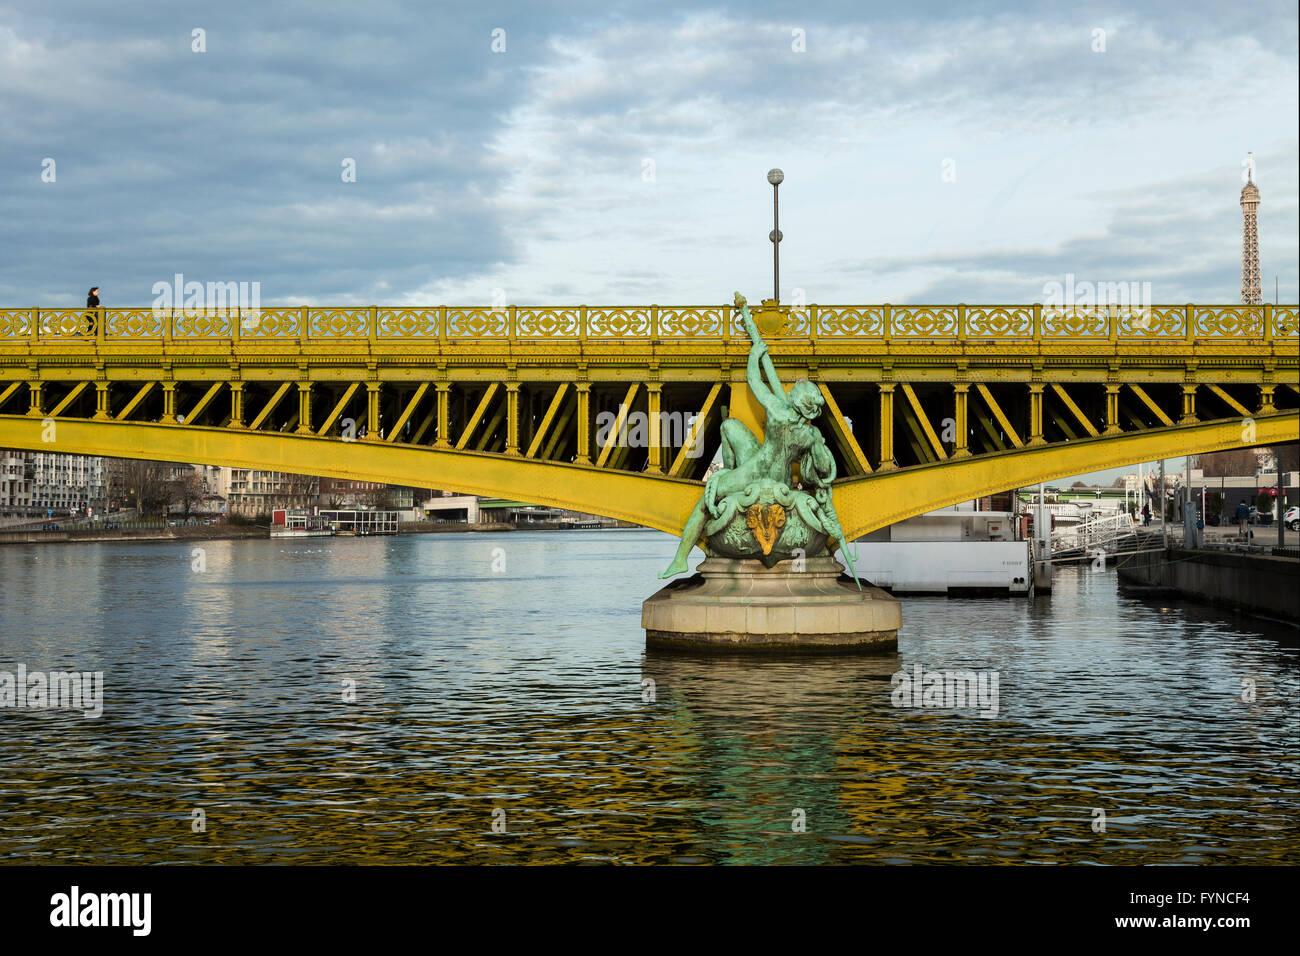 Mirabeau bridge, pont mirabeau, paris, 2015 - Stock Image